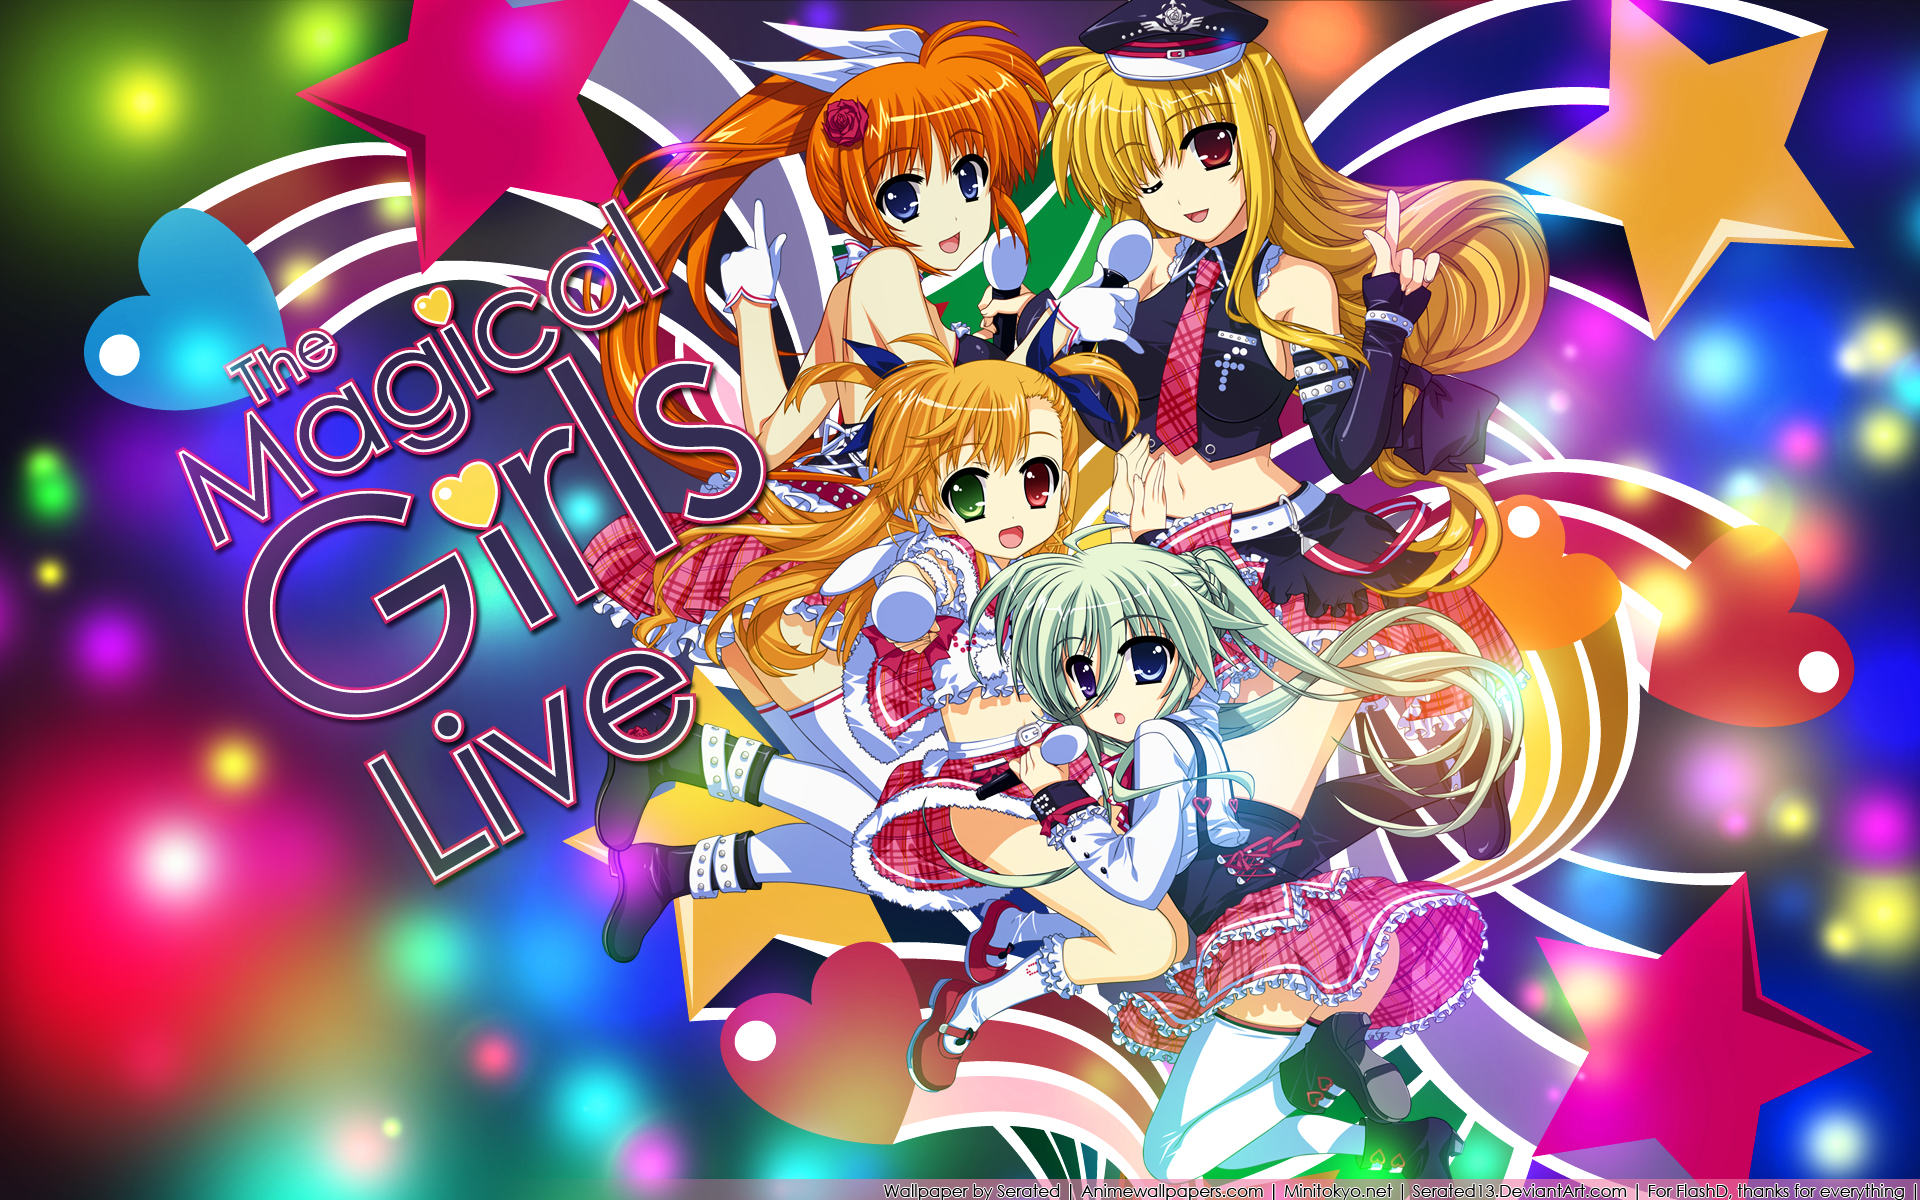 Mahou Shoujo Lyrical Nanoha Anime Wallpaper # 4